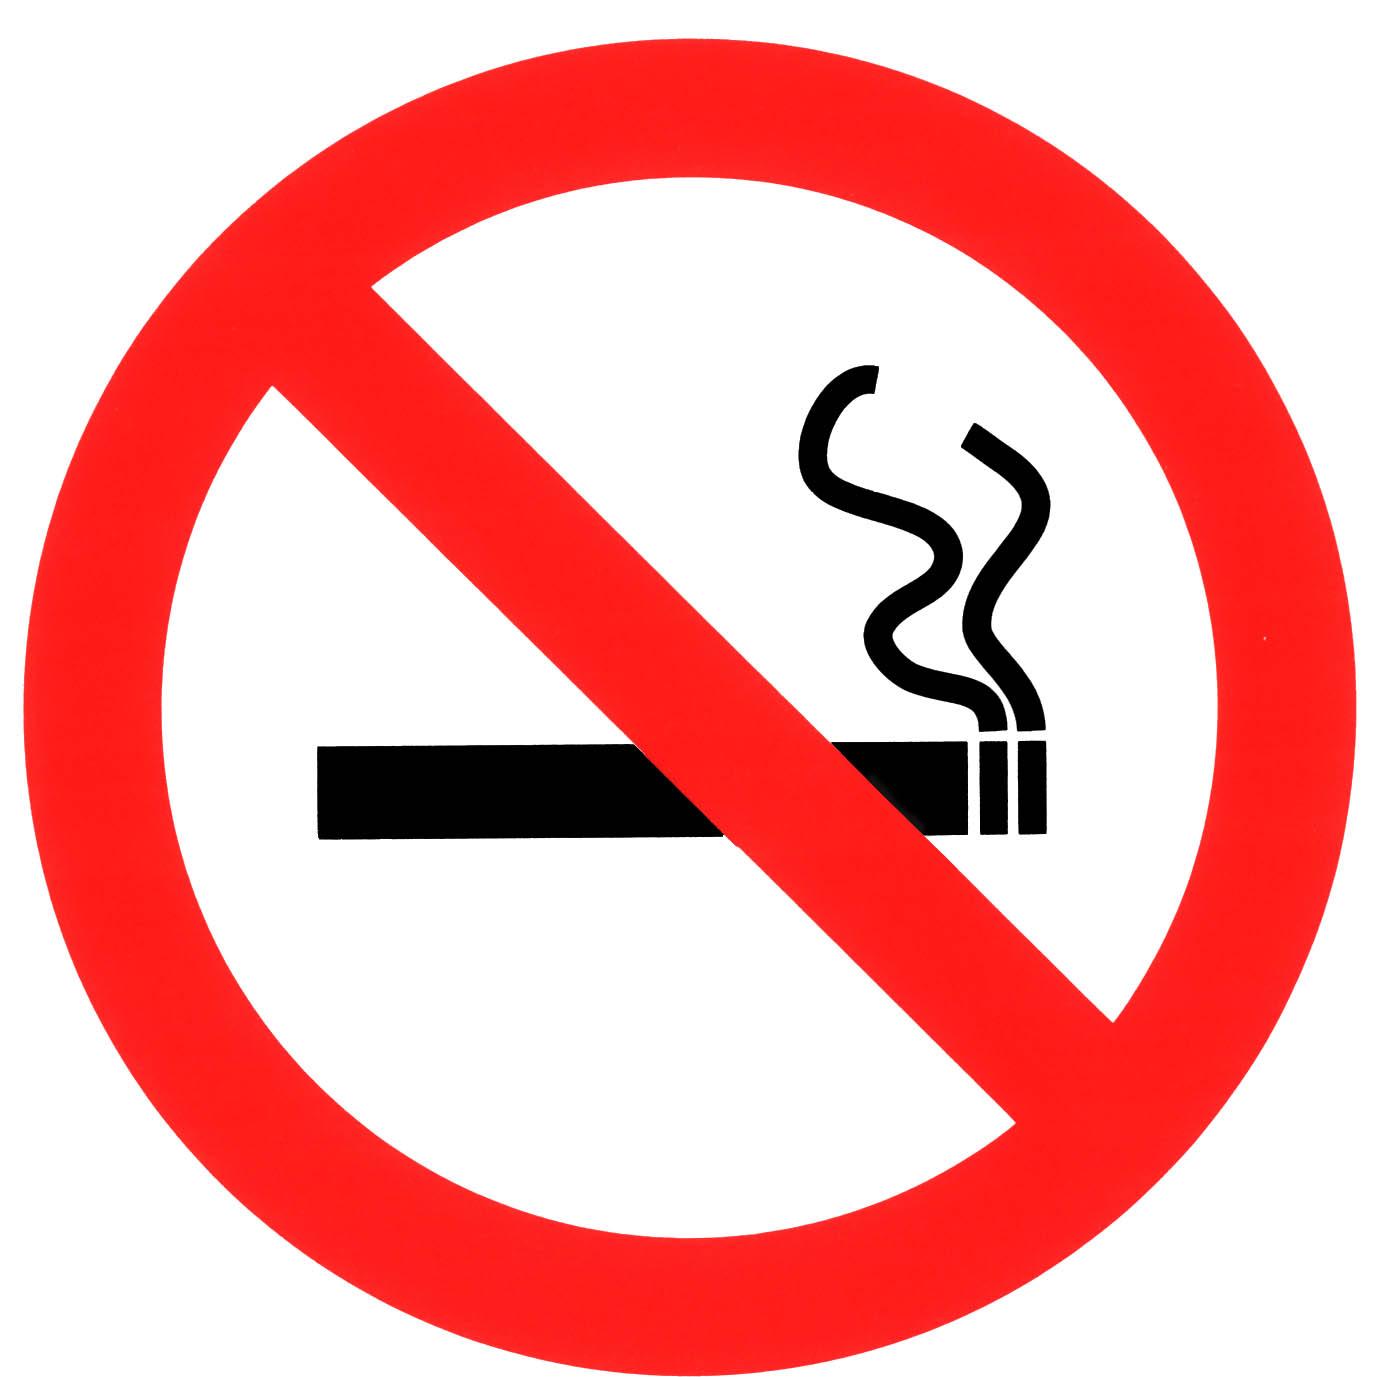 free clipart no smoking symbol - photo #31